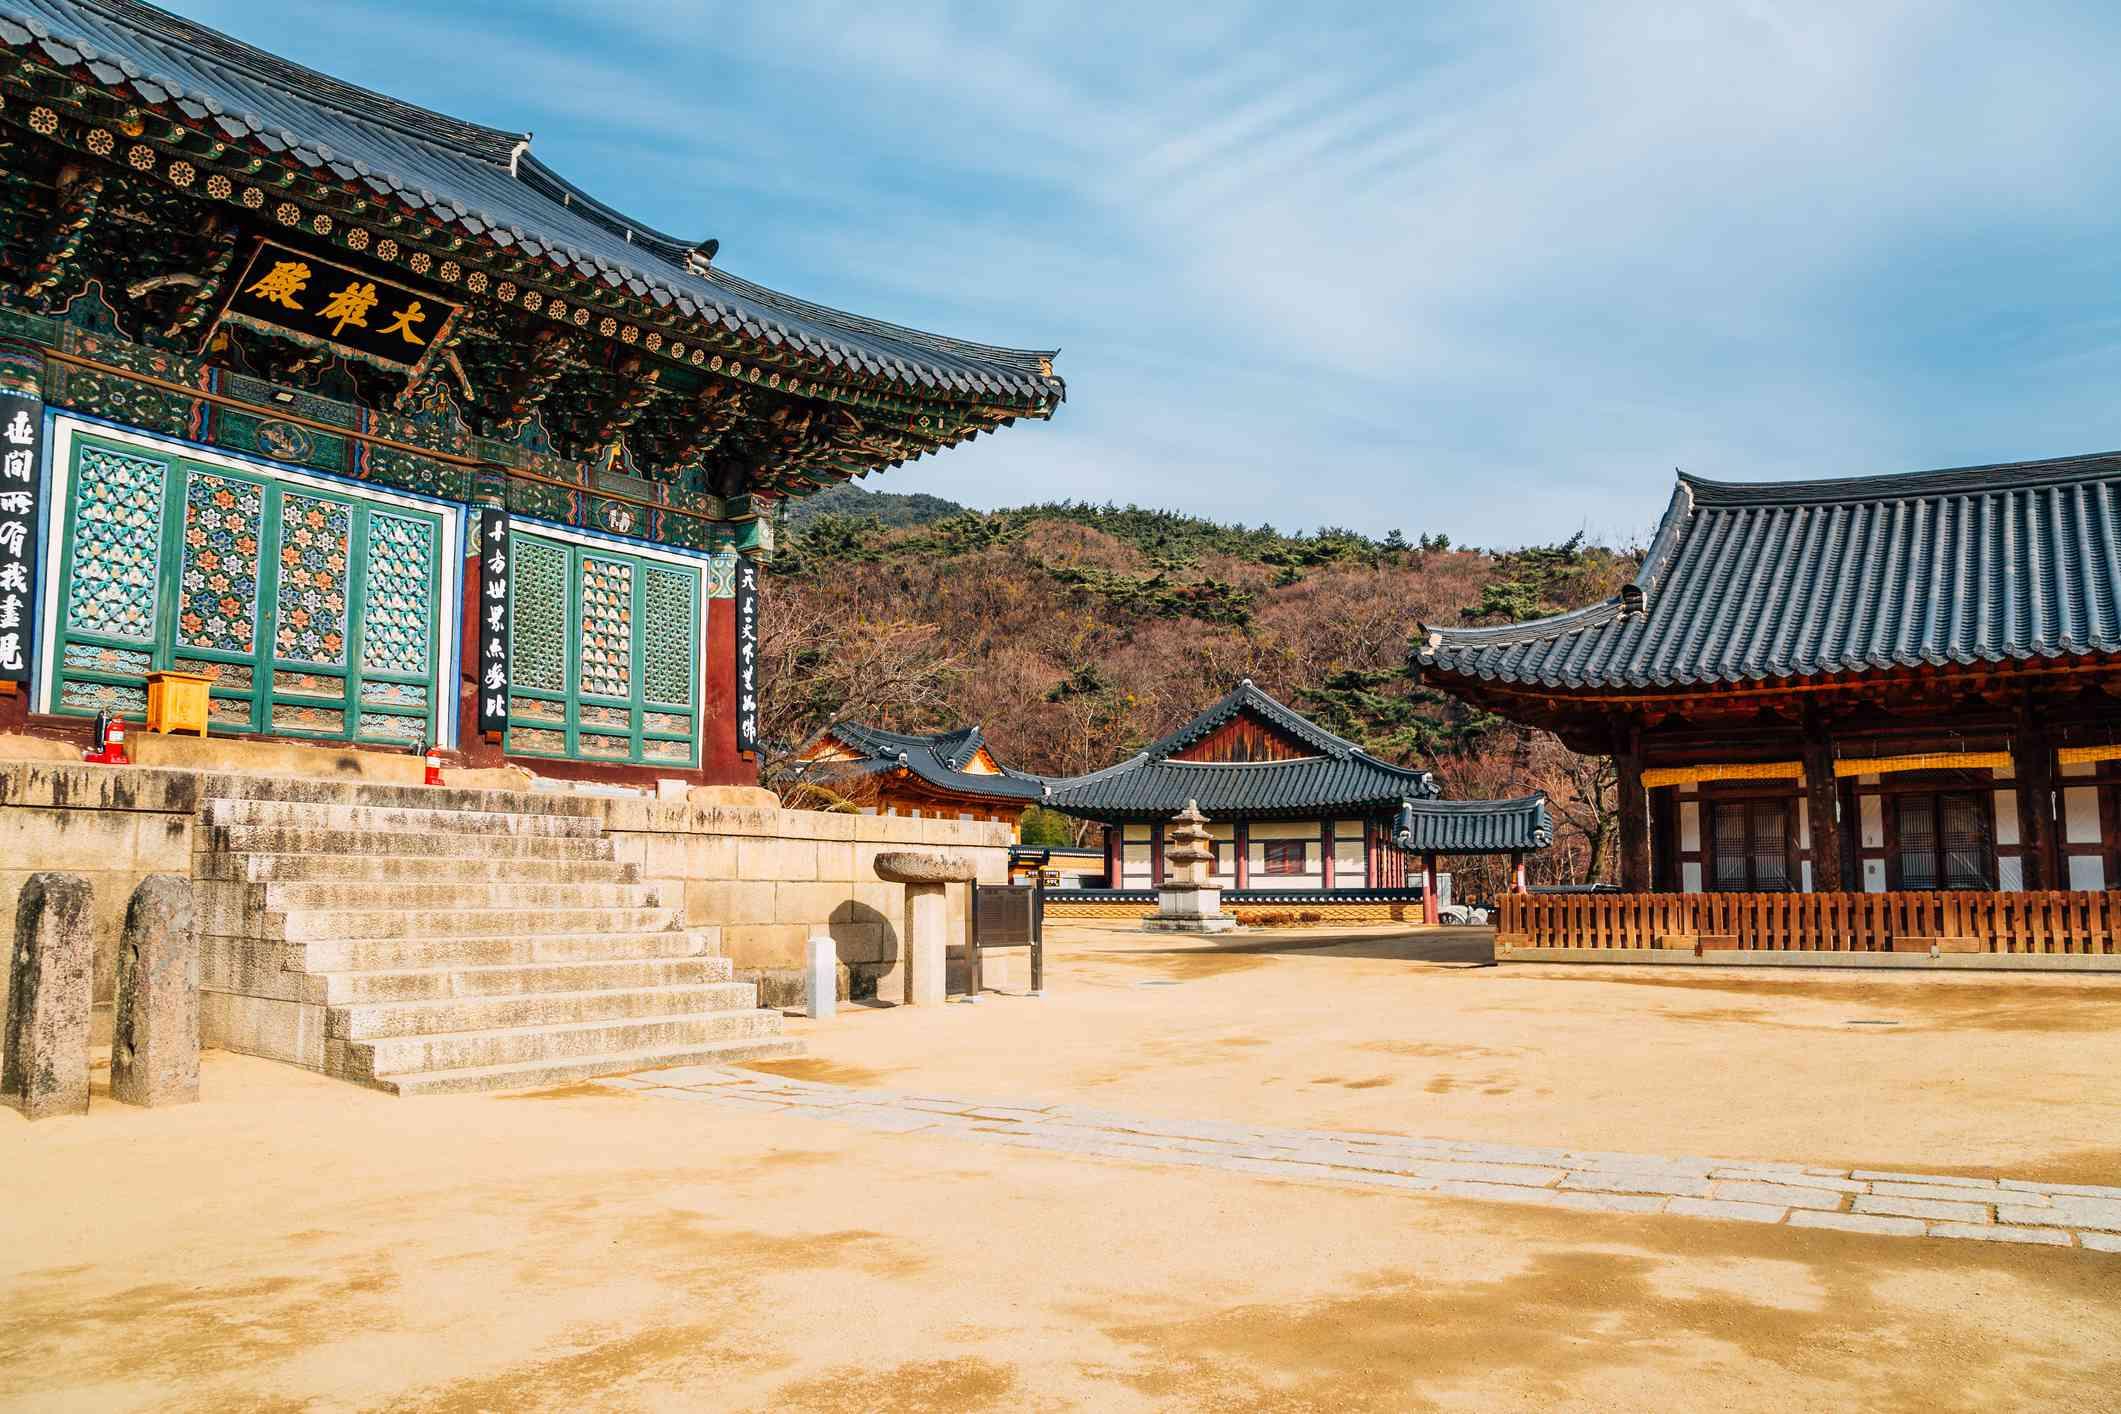 Korean traditional architecture in Donghwasa temple, Daegu, Korea